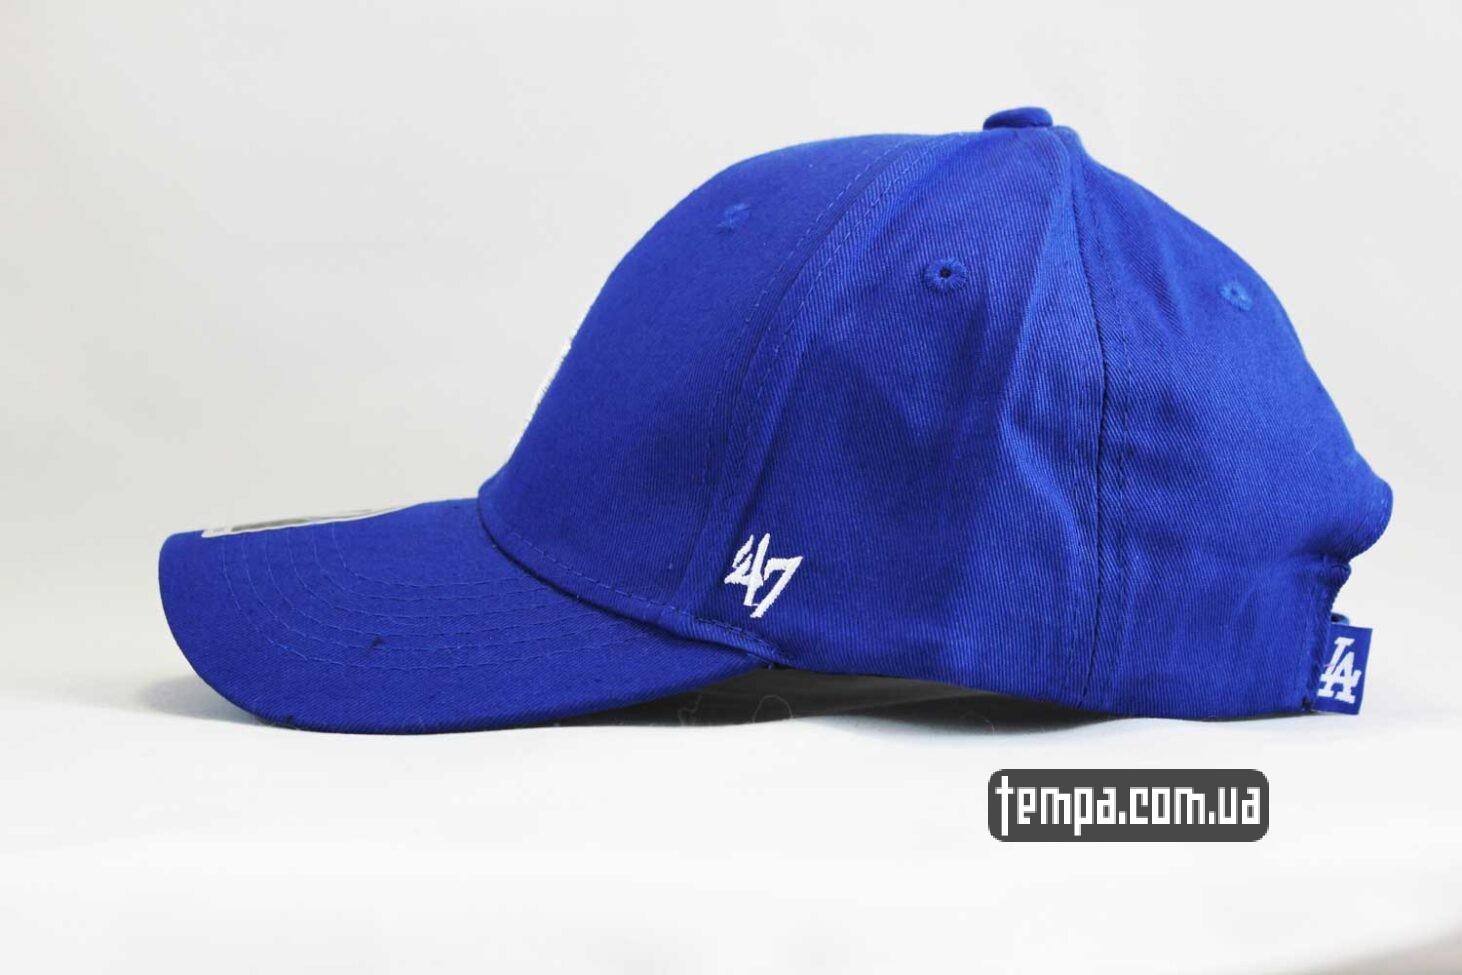 лос анджелес одежда купить кепка бейсболка snapback 47 new era Los Angeles LA синяя